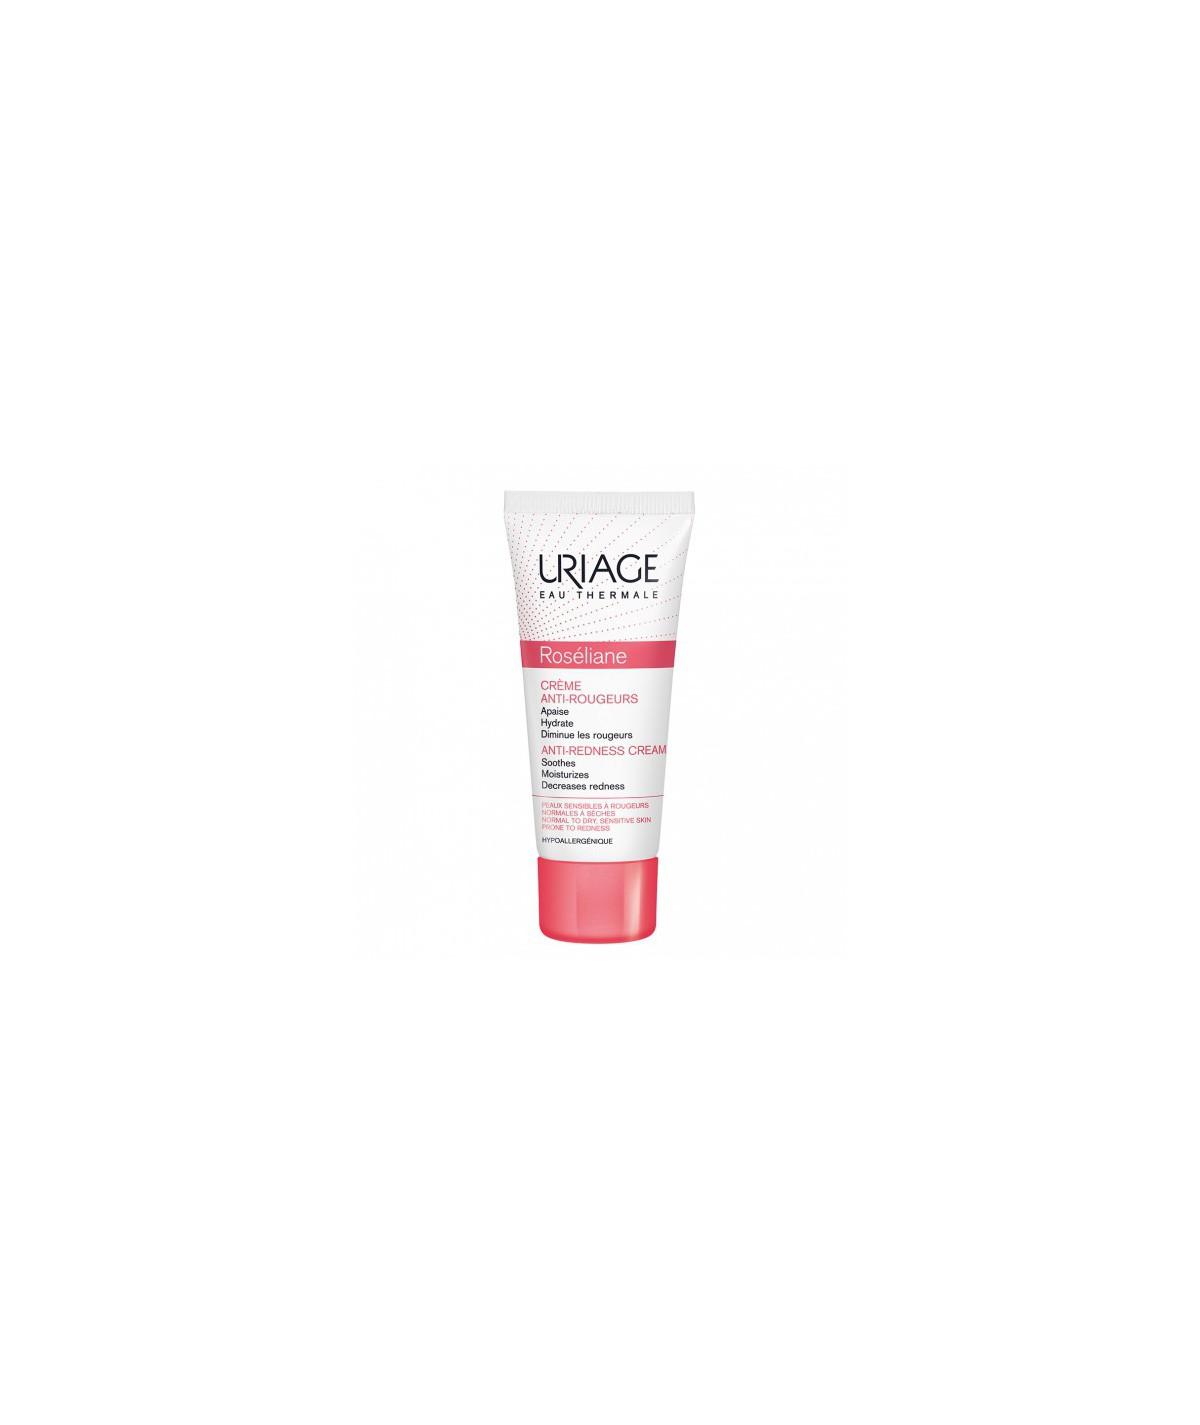 Uriage Roseliane Crema SPF30